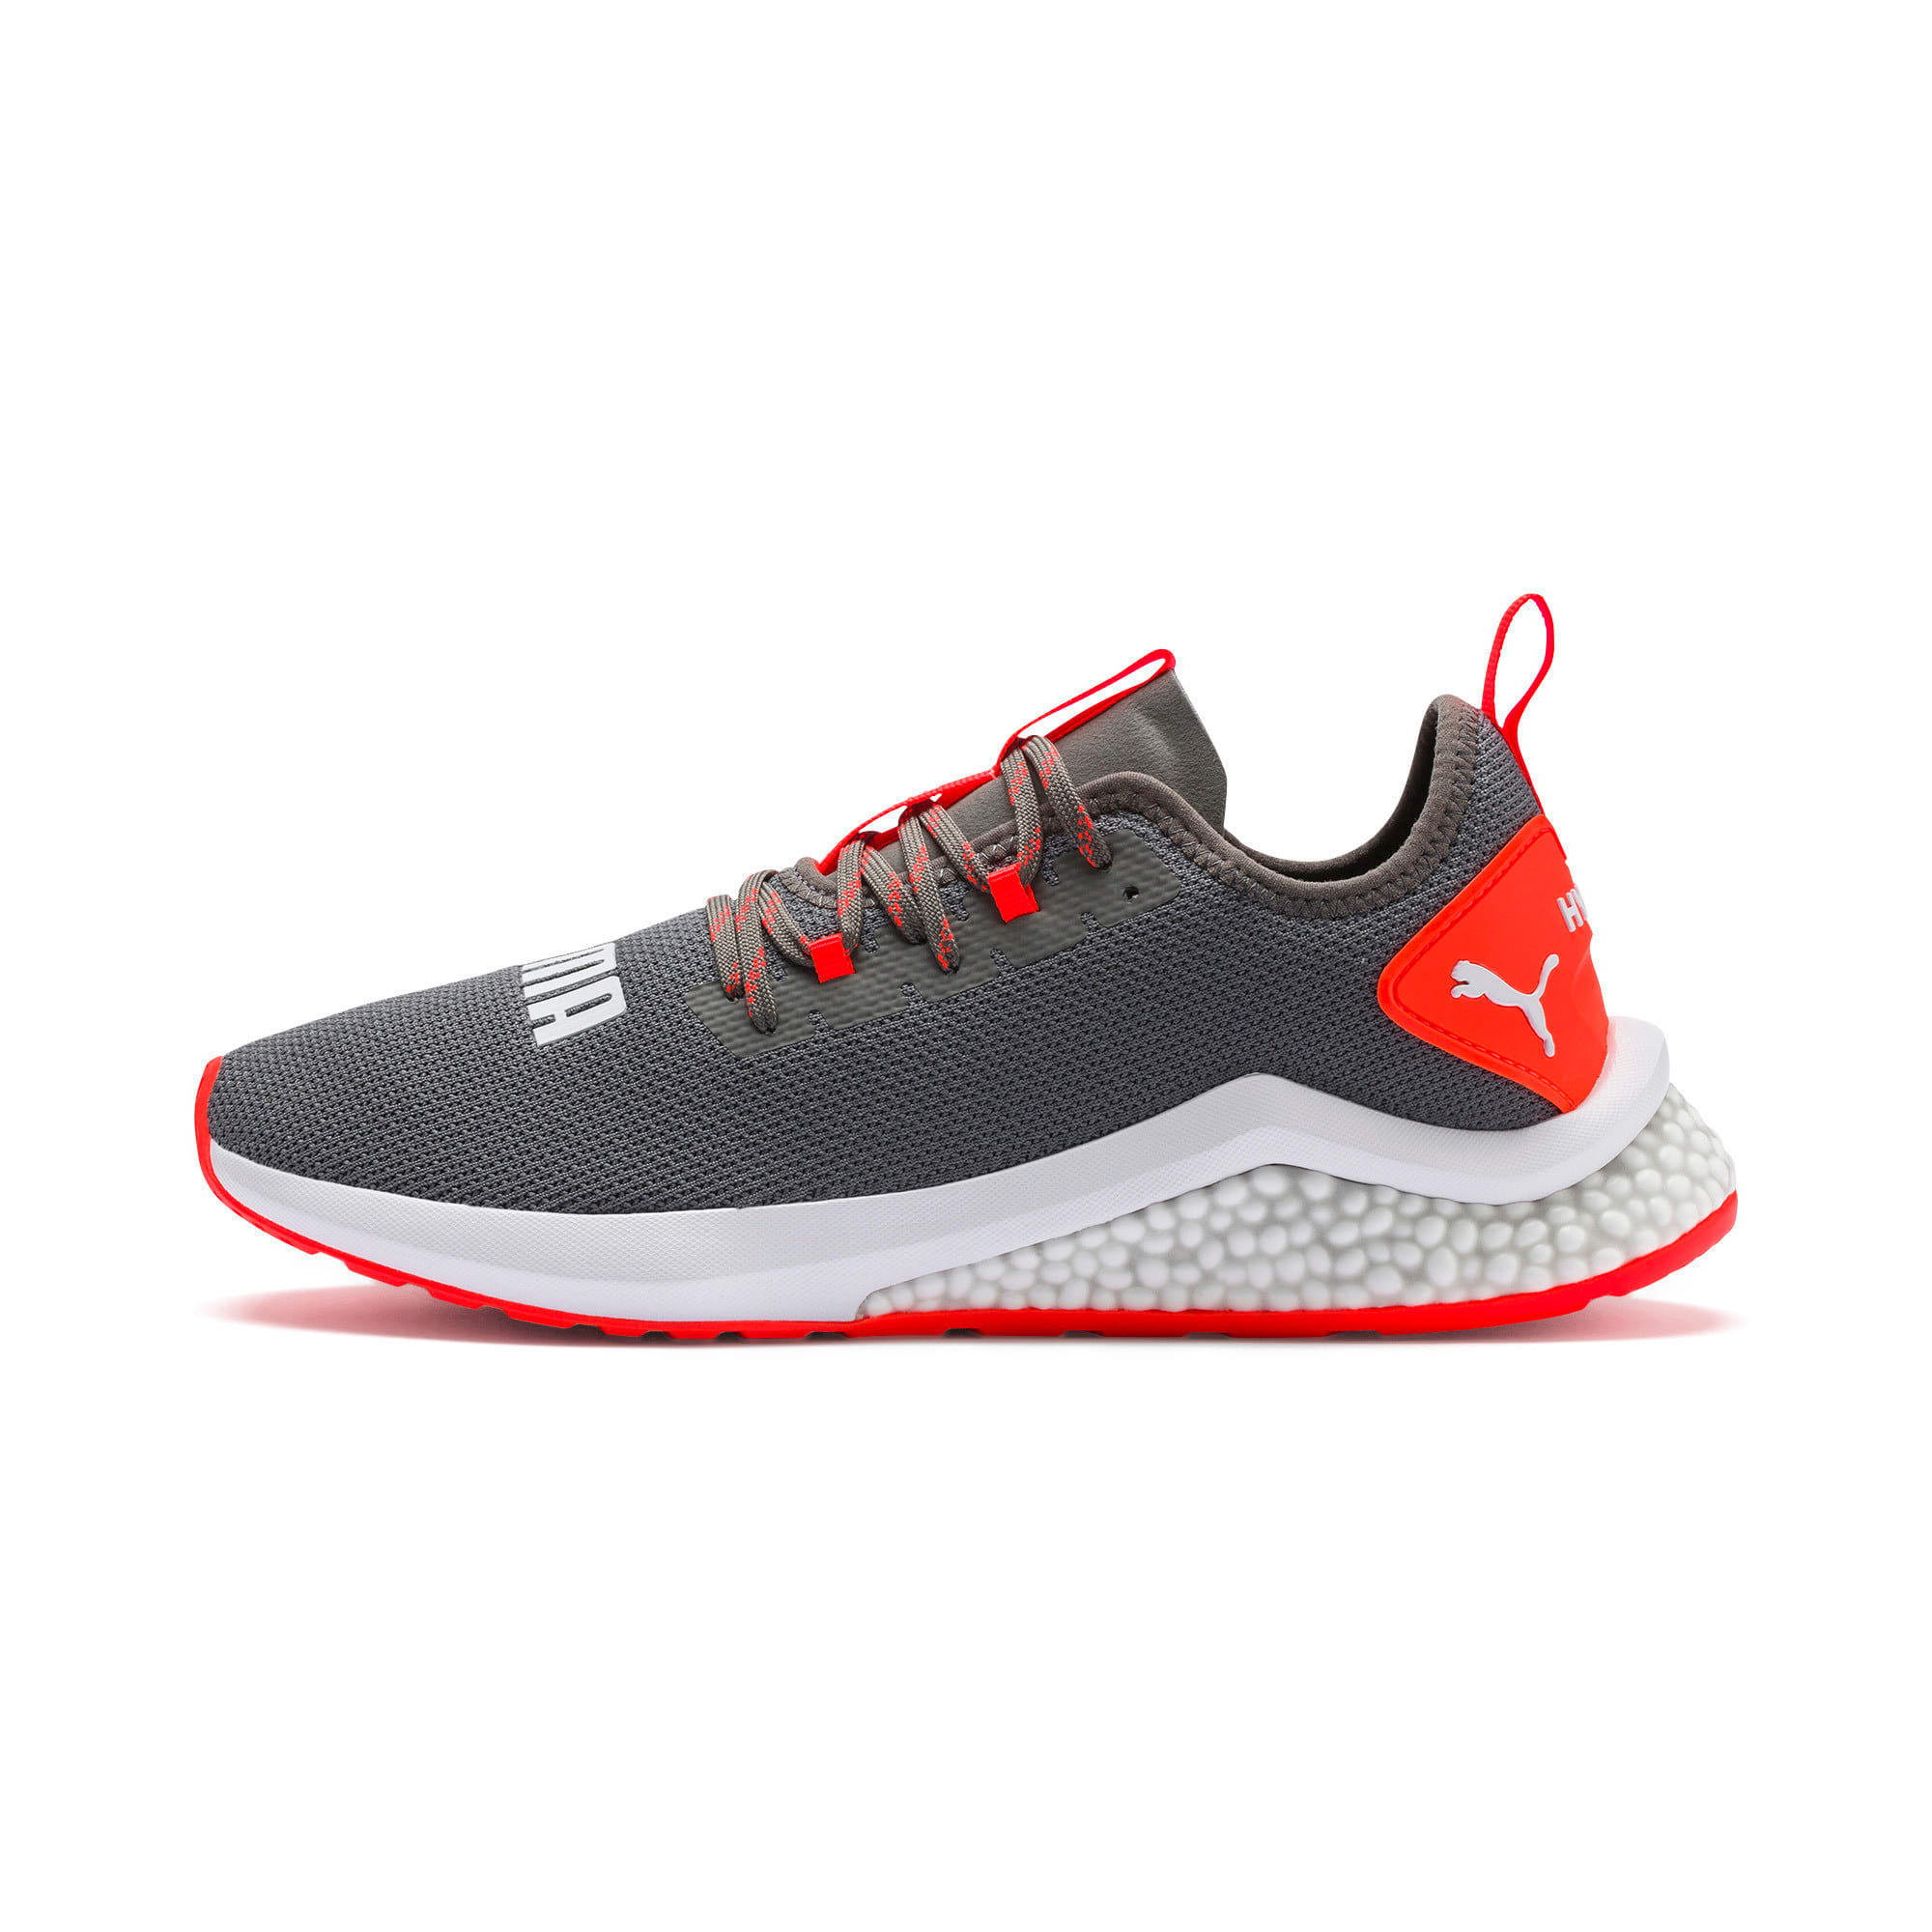 Thumbnail 1 of HYBRID NX Men's Running Shoes, CASTLEROCK-Nrgy Red, medium